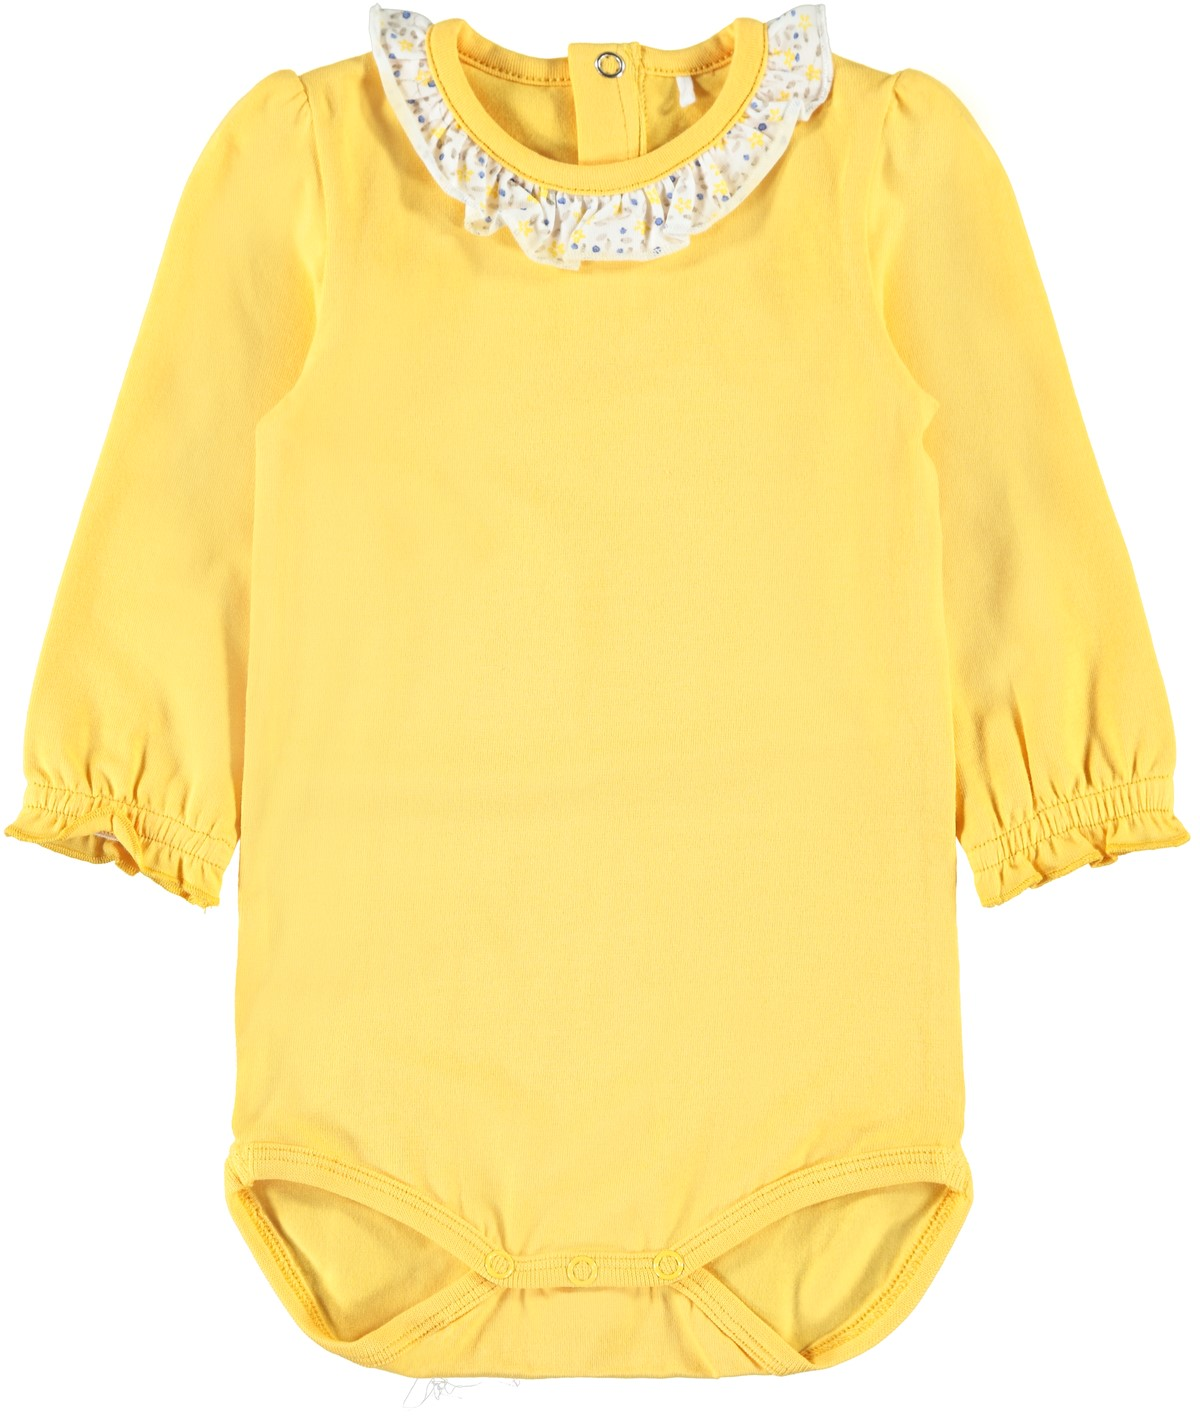 309f2952 Name It gul body. Gul body til baby jente. Klær til baby fra Name It.